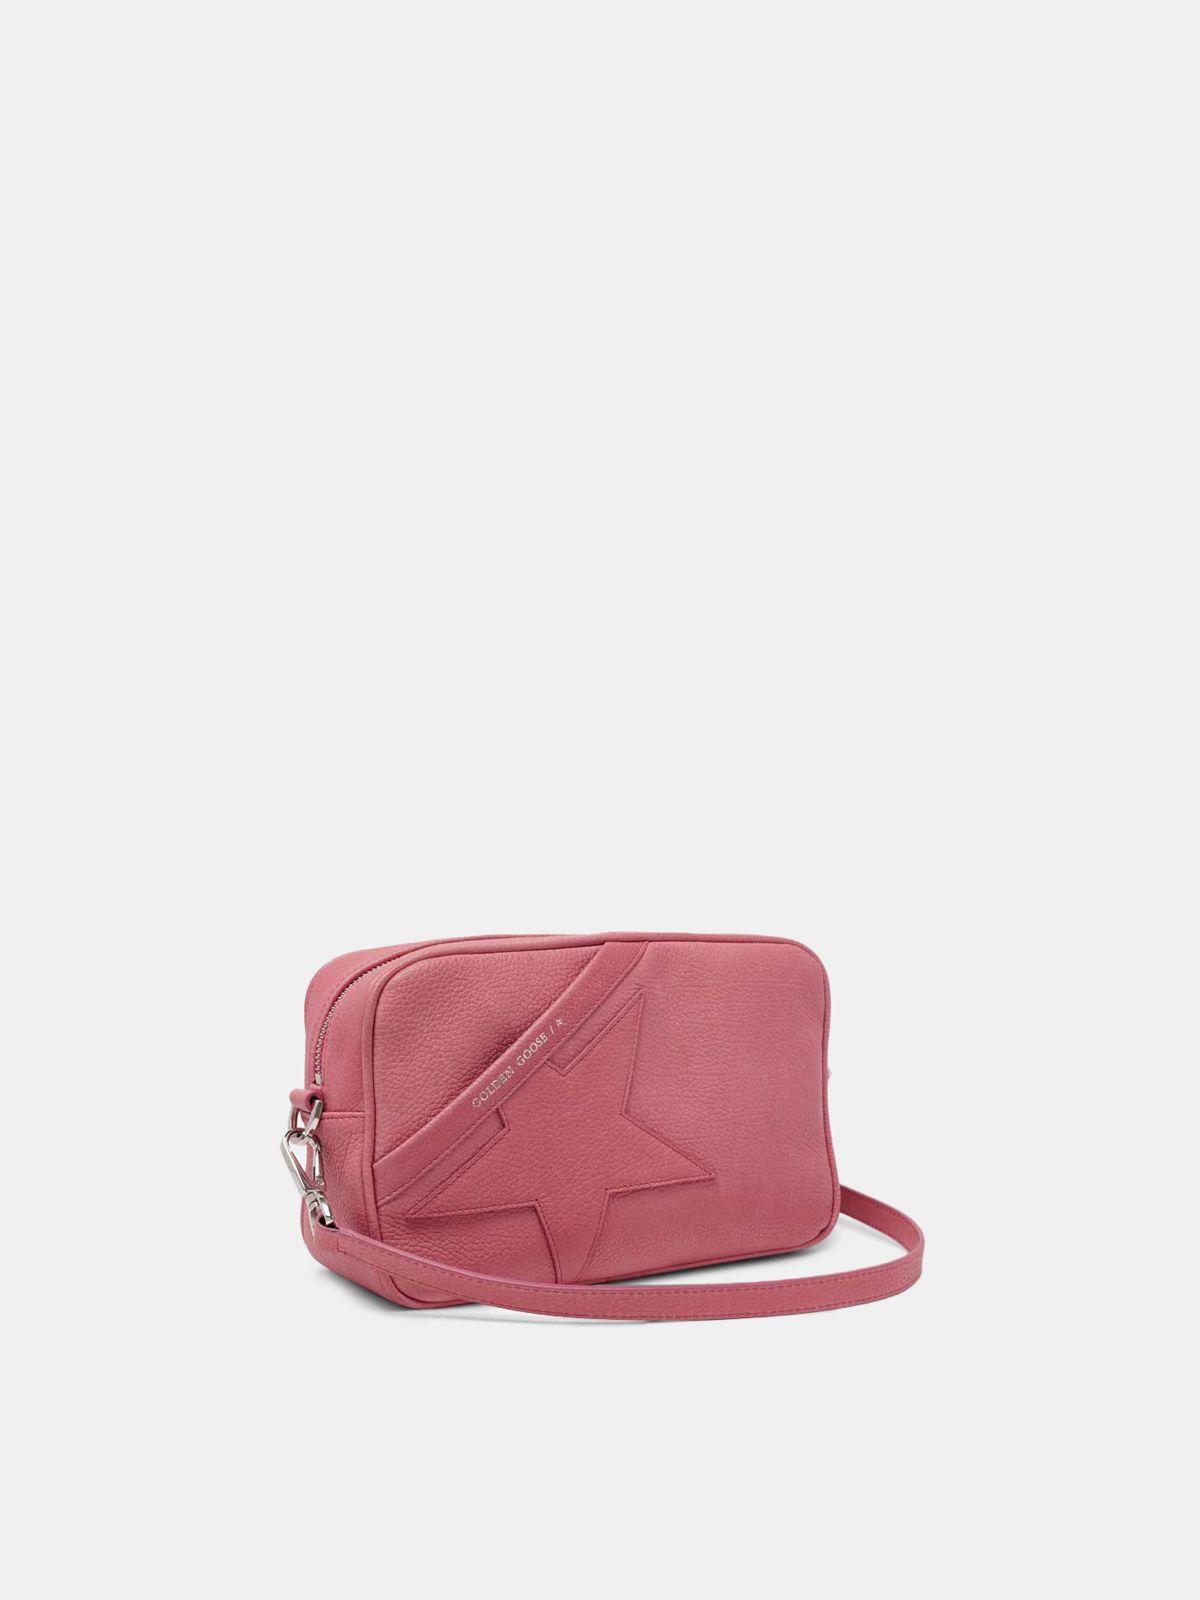 Golden Goose - Pink Star Bag with shoulder strap made of pebbled leather in